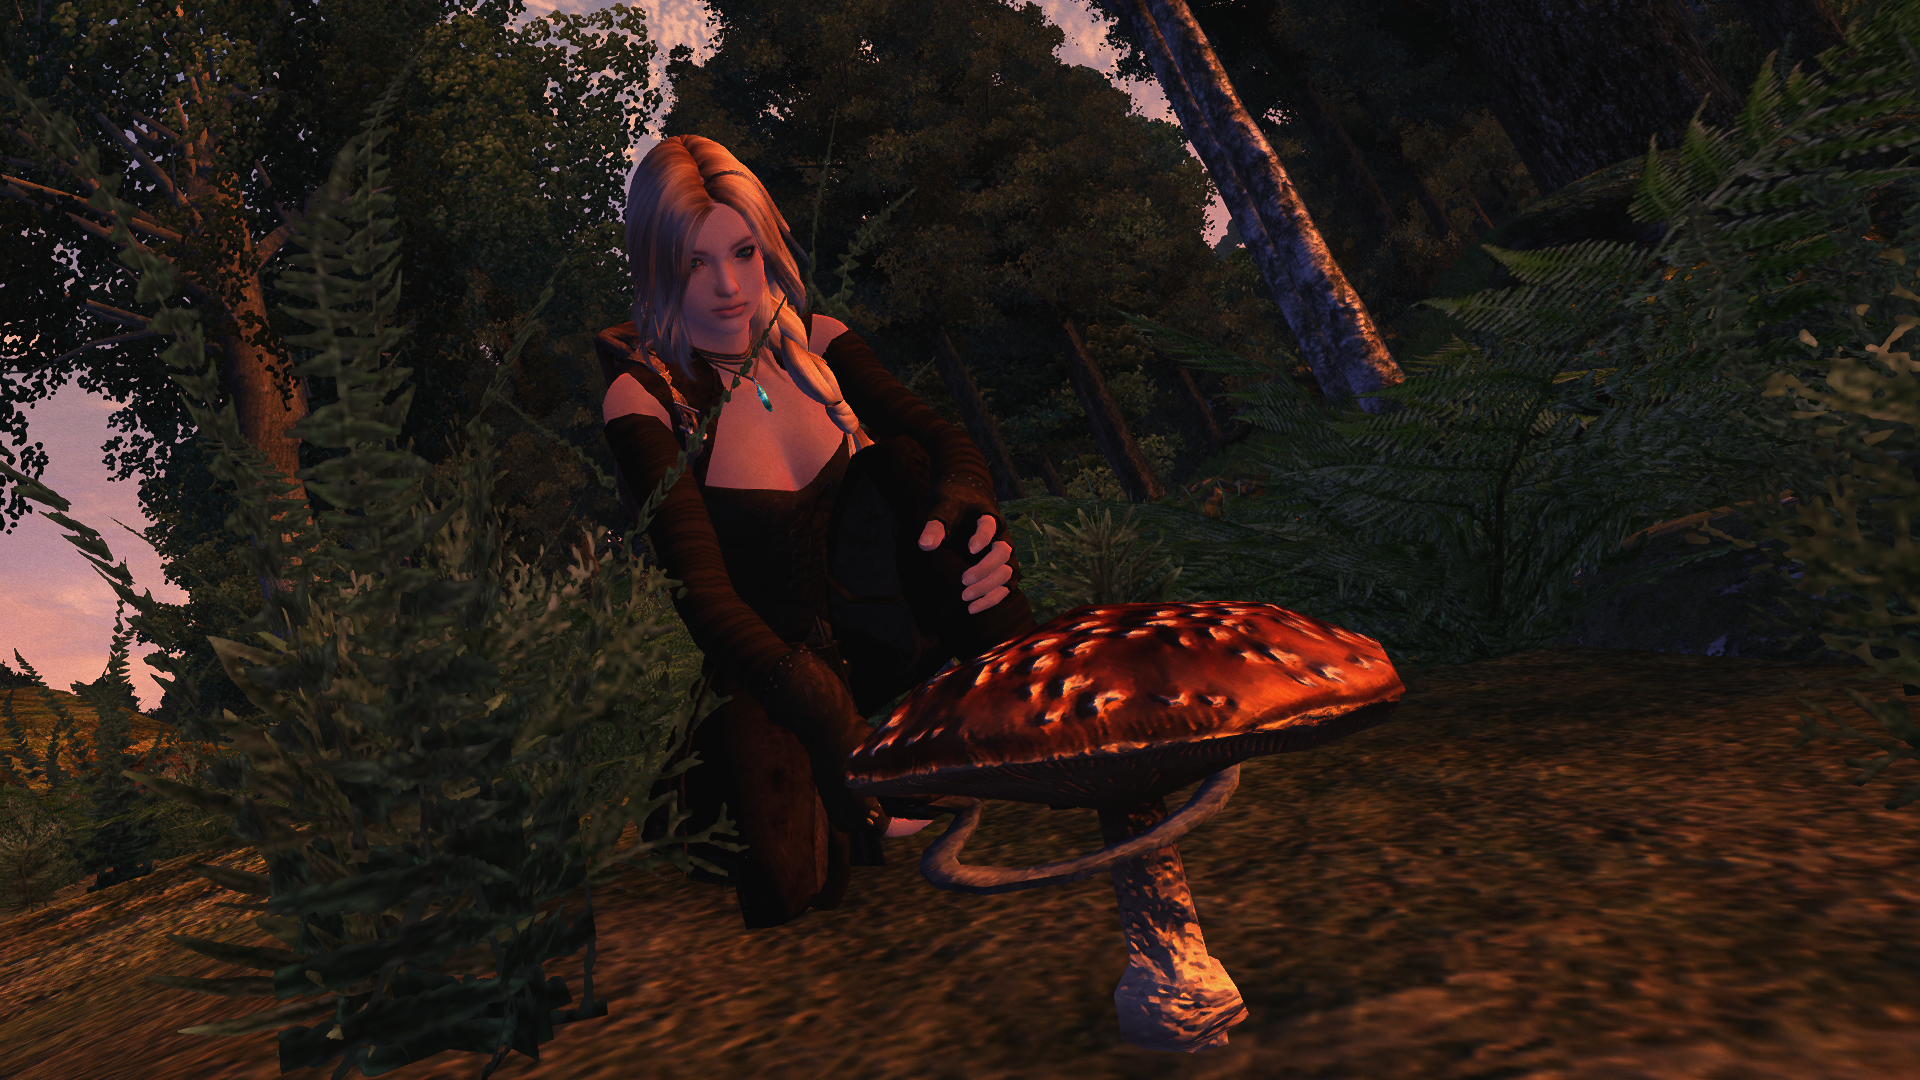 Elli picking a mushroom